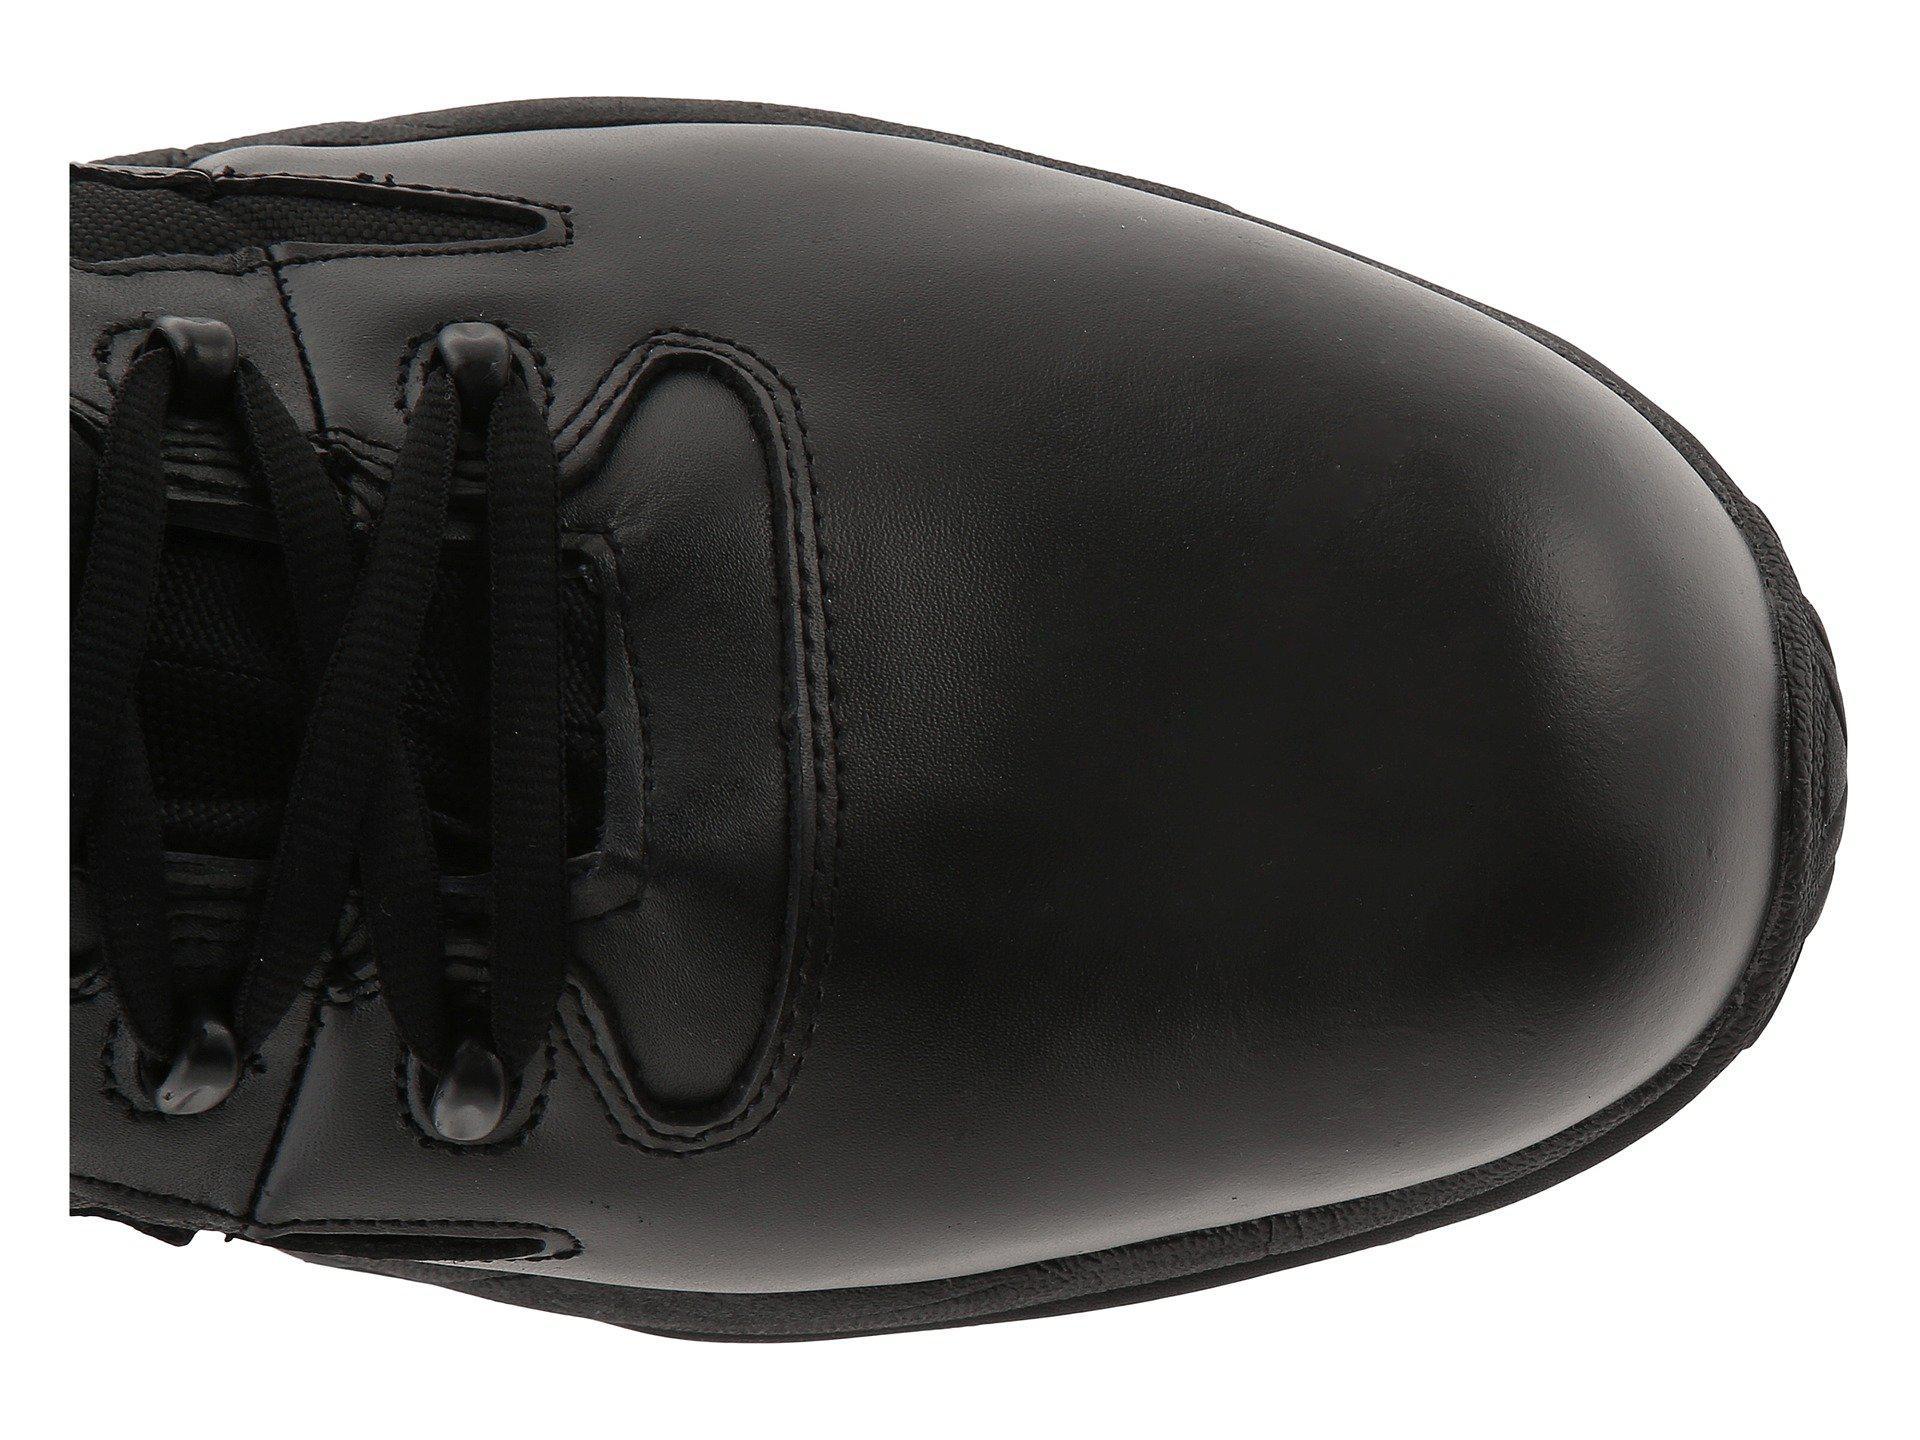 56606bffb6ff Reebok - Rapid Response Rb 8 Soft Toe (black) Men s Work Boots for Men.  View fullscreen